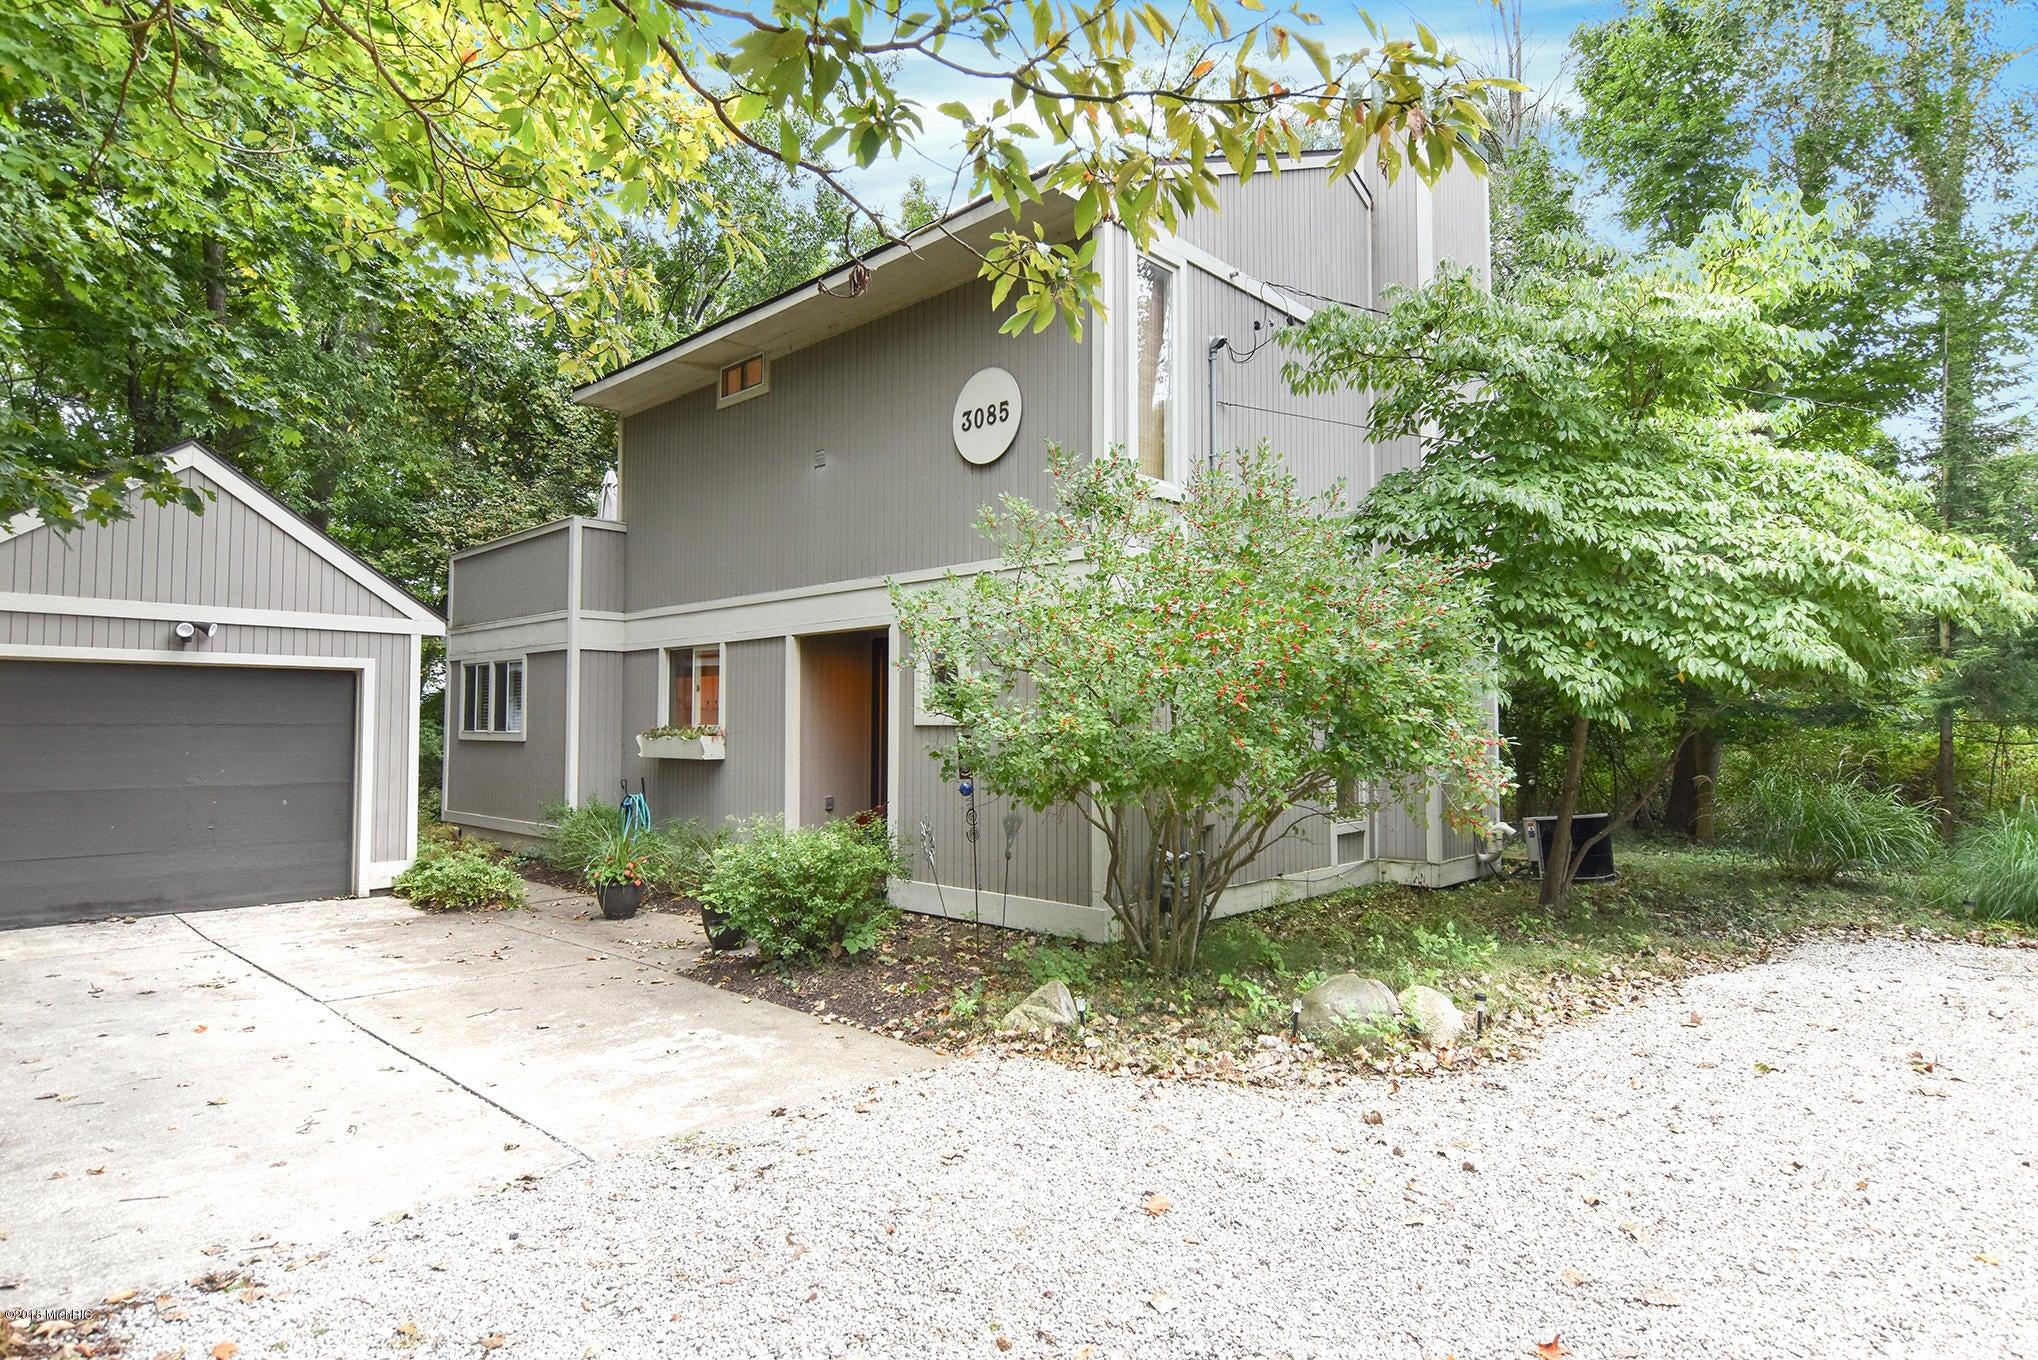 3085 Whittier Avenue, Douglas, MI 49406